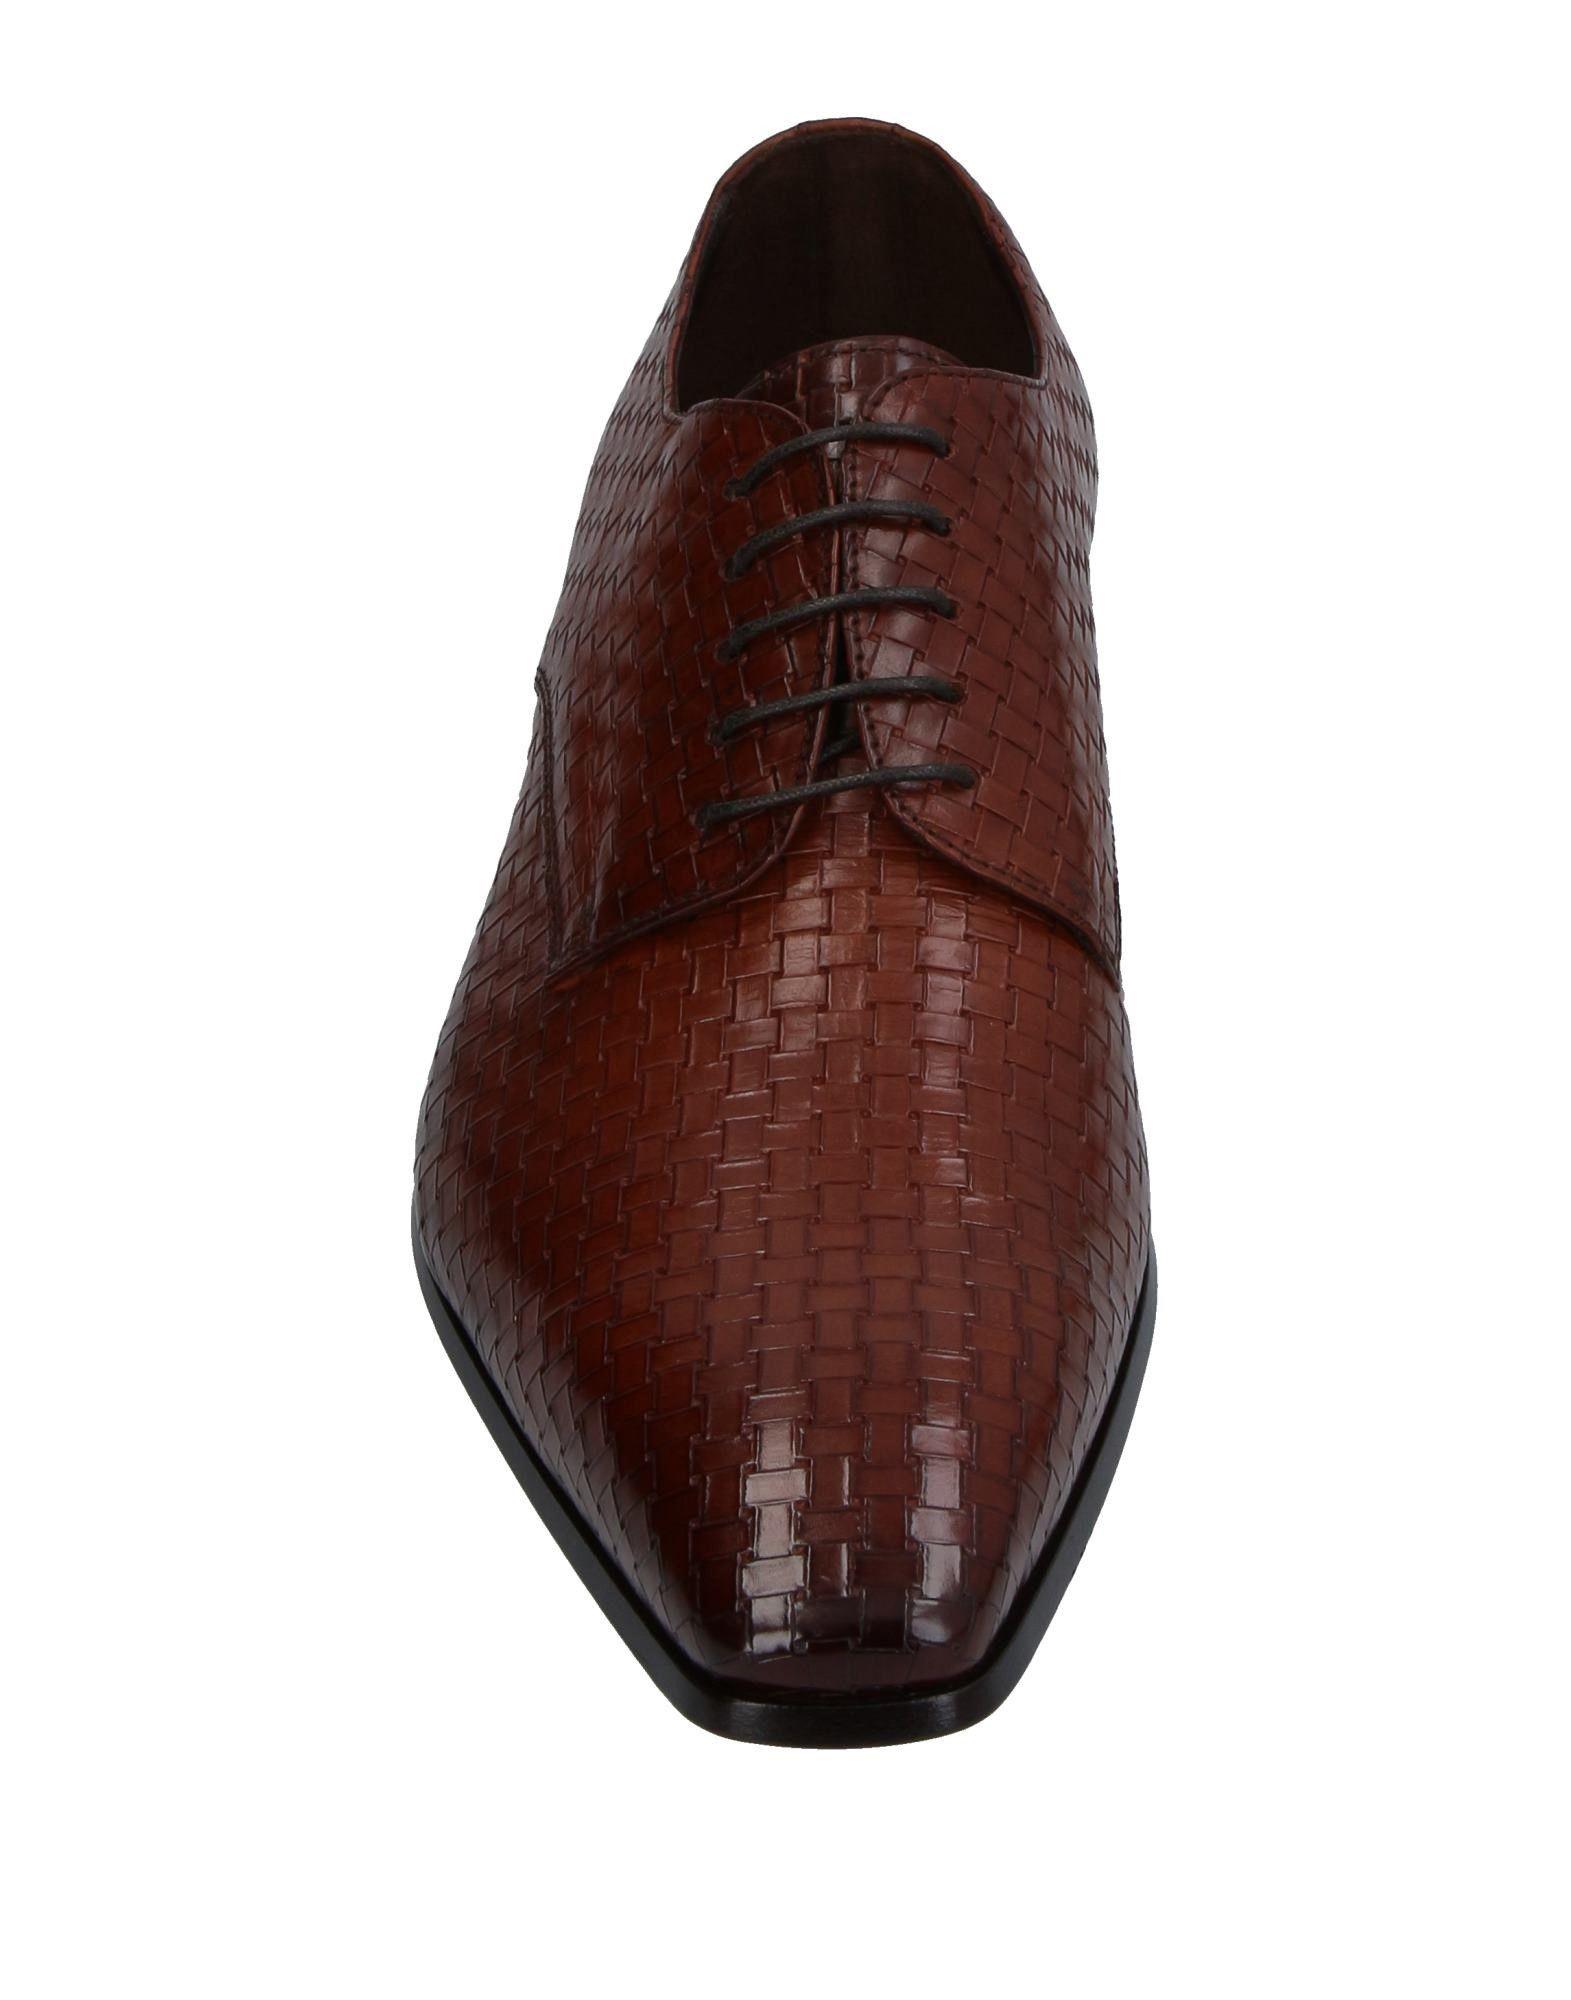 Doucal's Schnürschuhe Herren Heiße  11407481FC Heiße Herren Schuhe 242c72